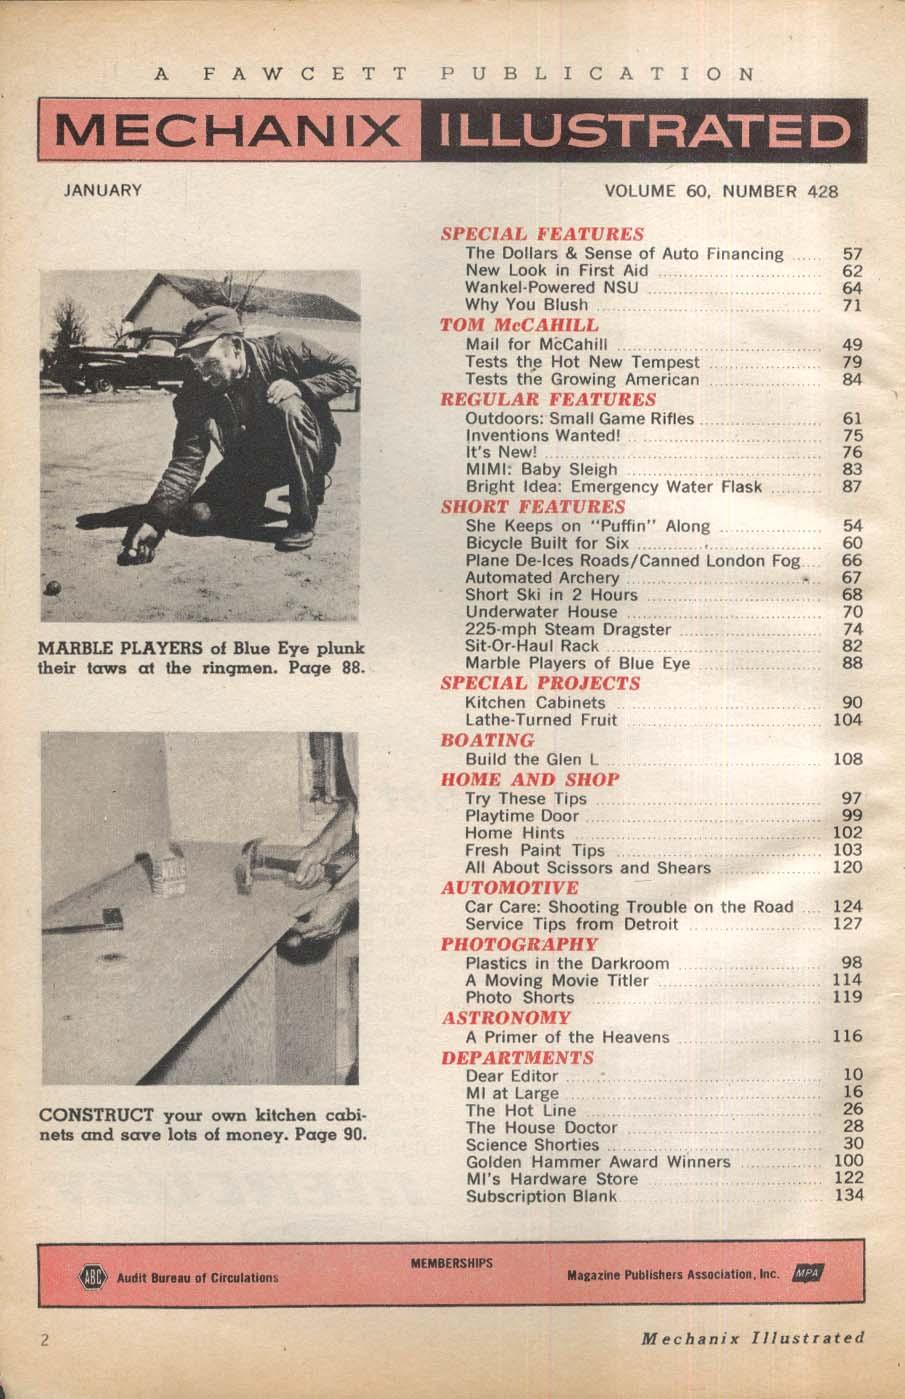 MECHANIX ILLUSTRATED Pontiac Tempest Rambler American road tests 1 1964